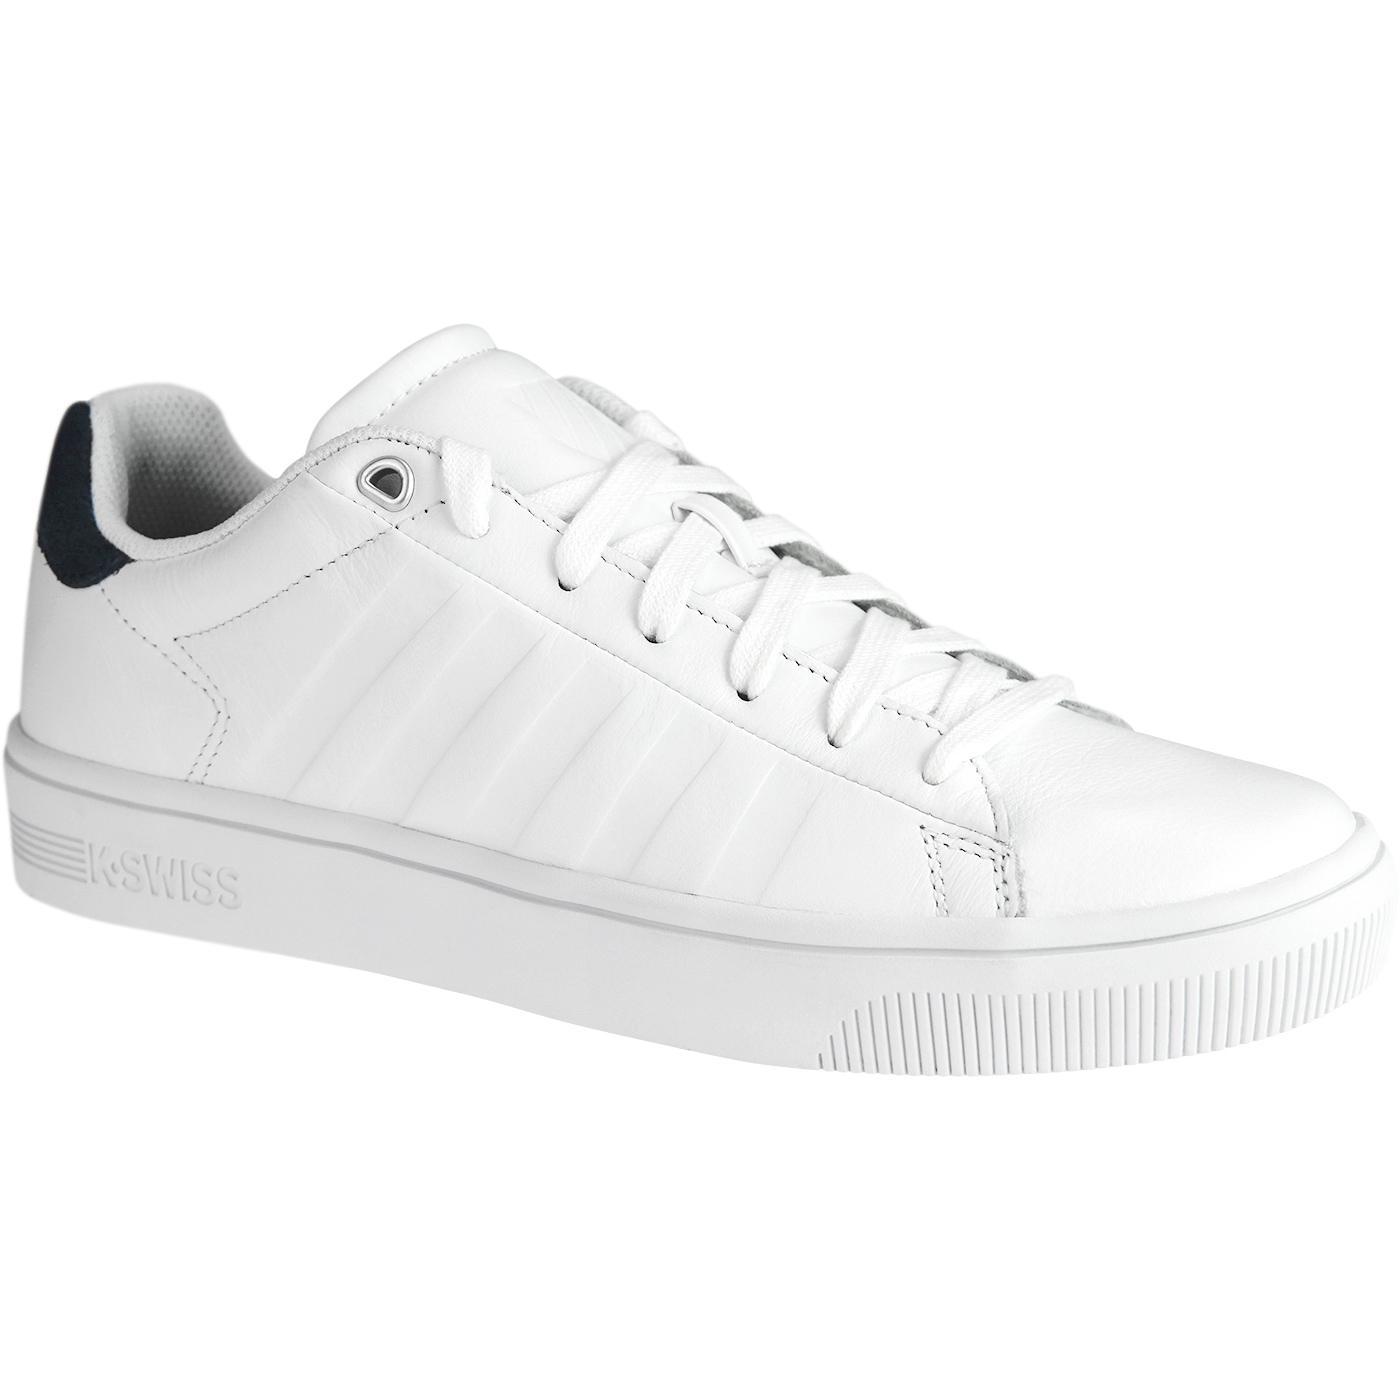 Court Frasco K-SWISS Retro Leather Trainers WHITE